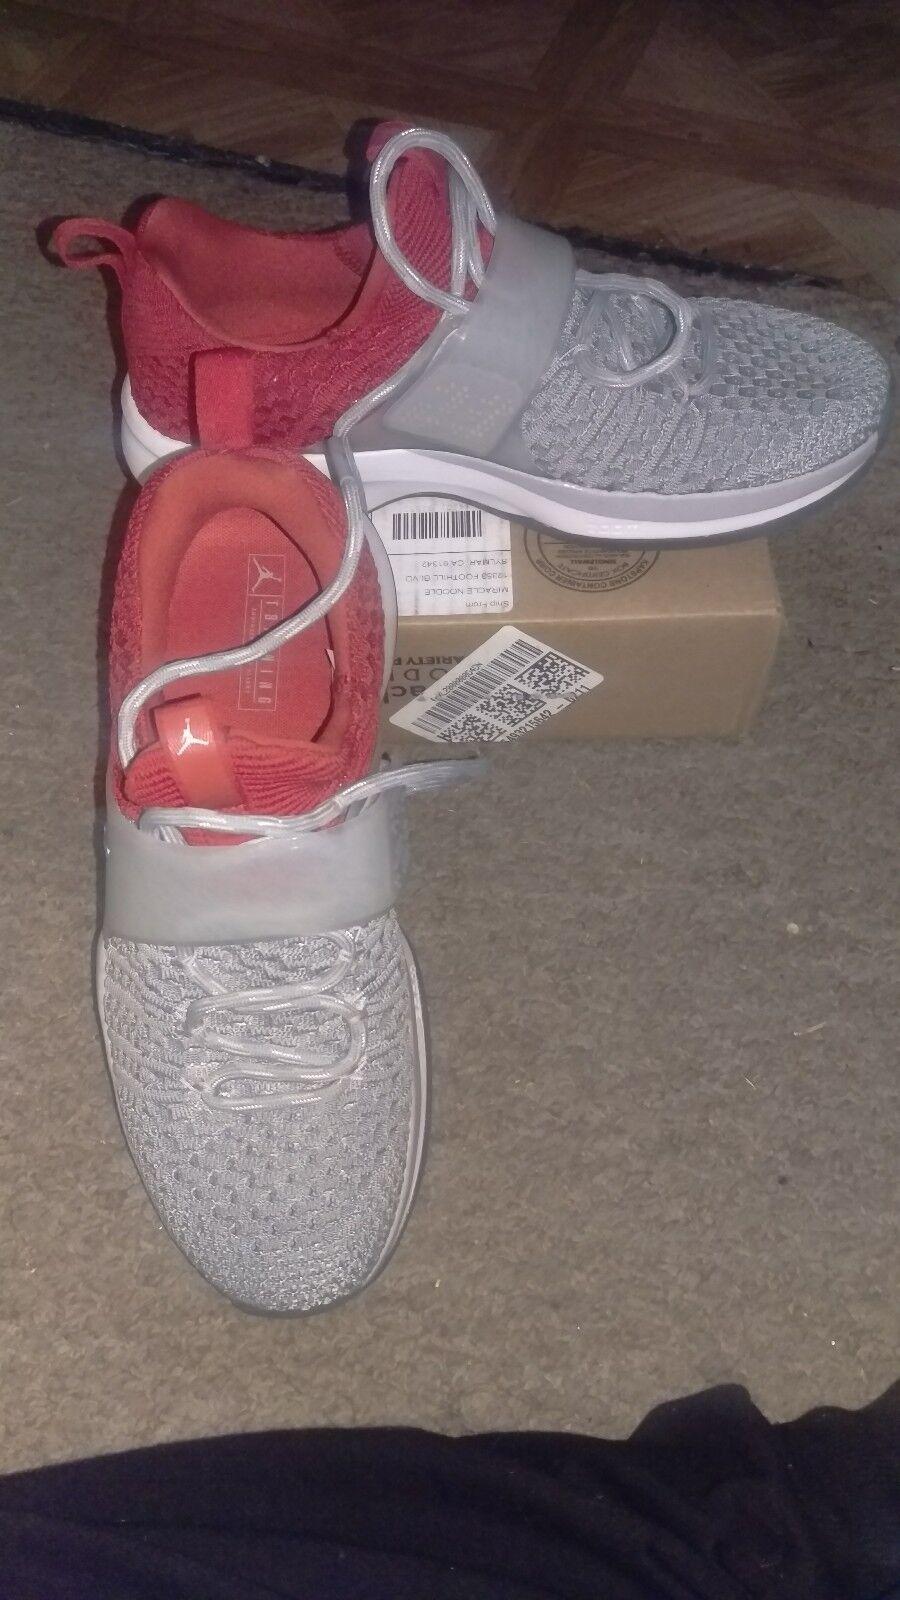 Jordan formatori 2 rosso flynit sz 8 Uomo rosso 2 / gray leggermente usato b92d94